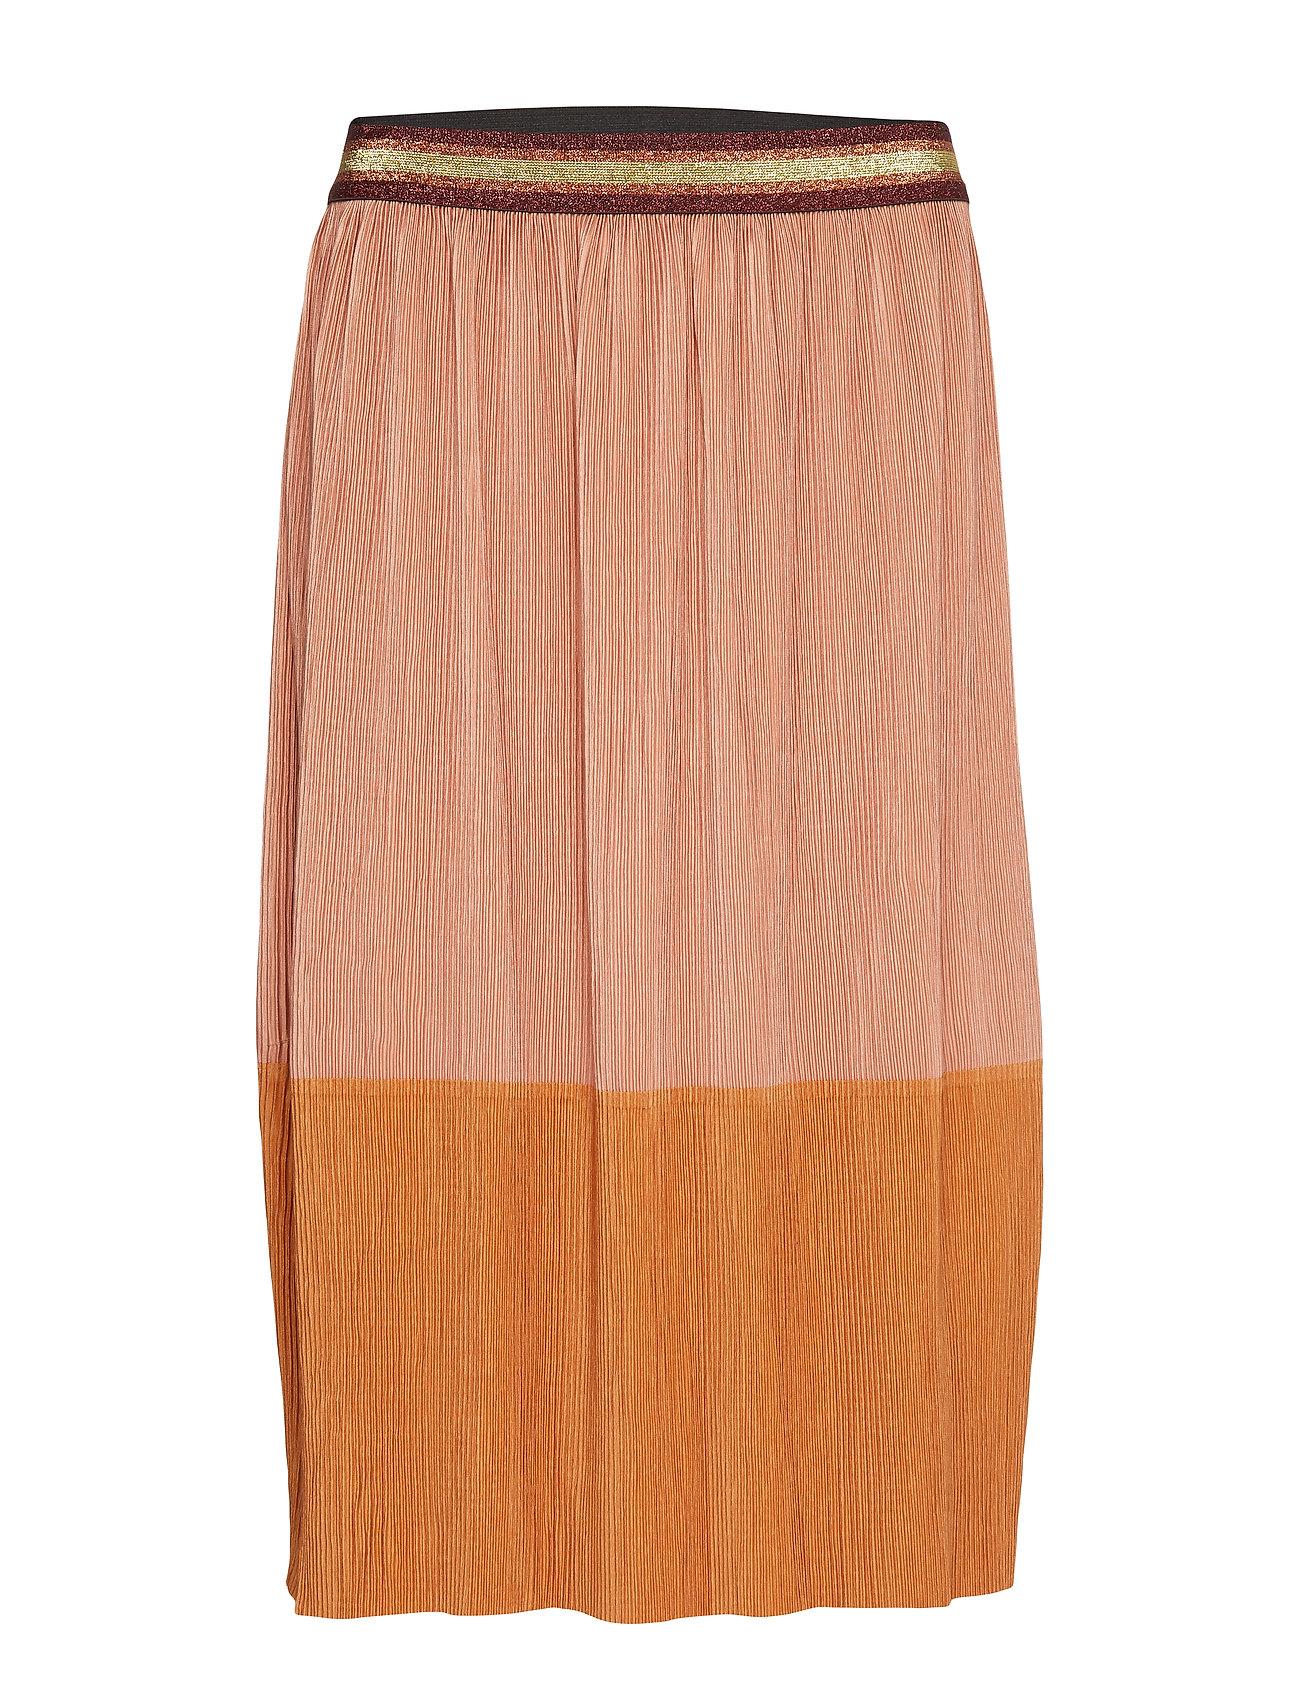 Sofie Schnoor Skirt - ROSE